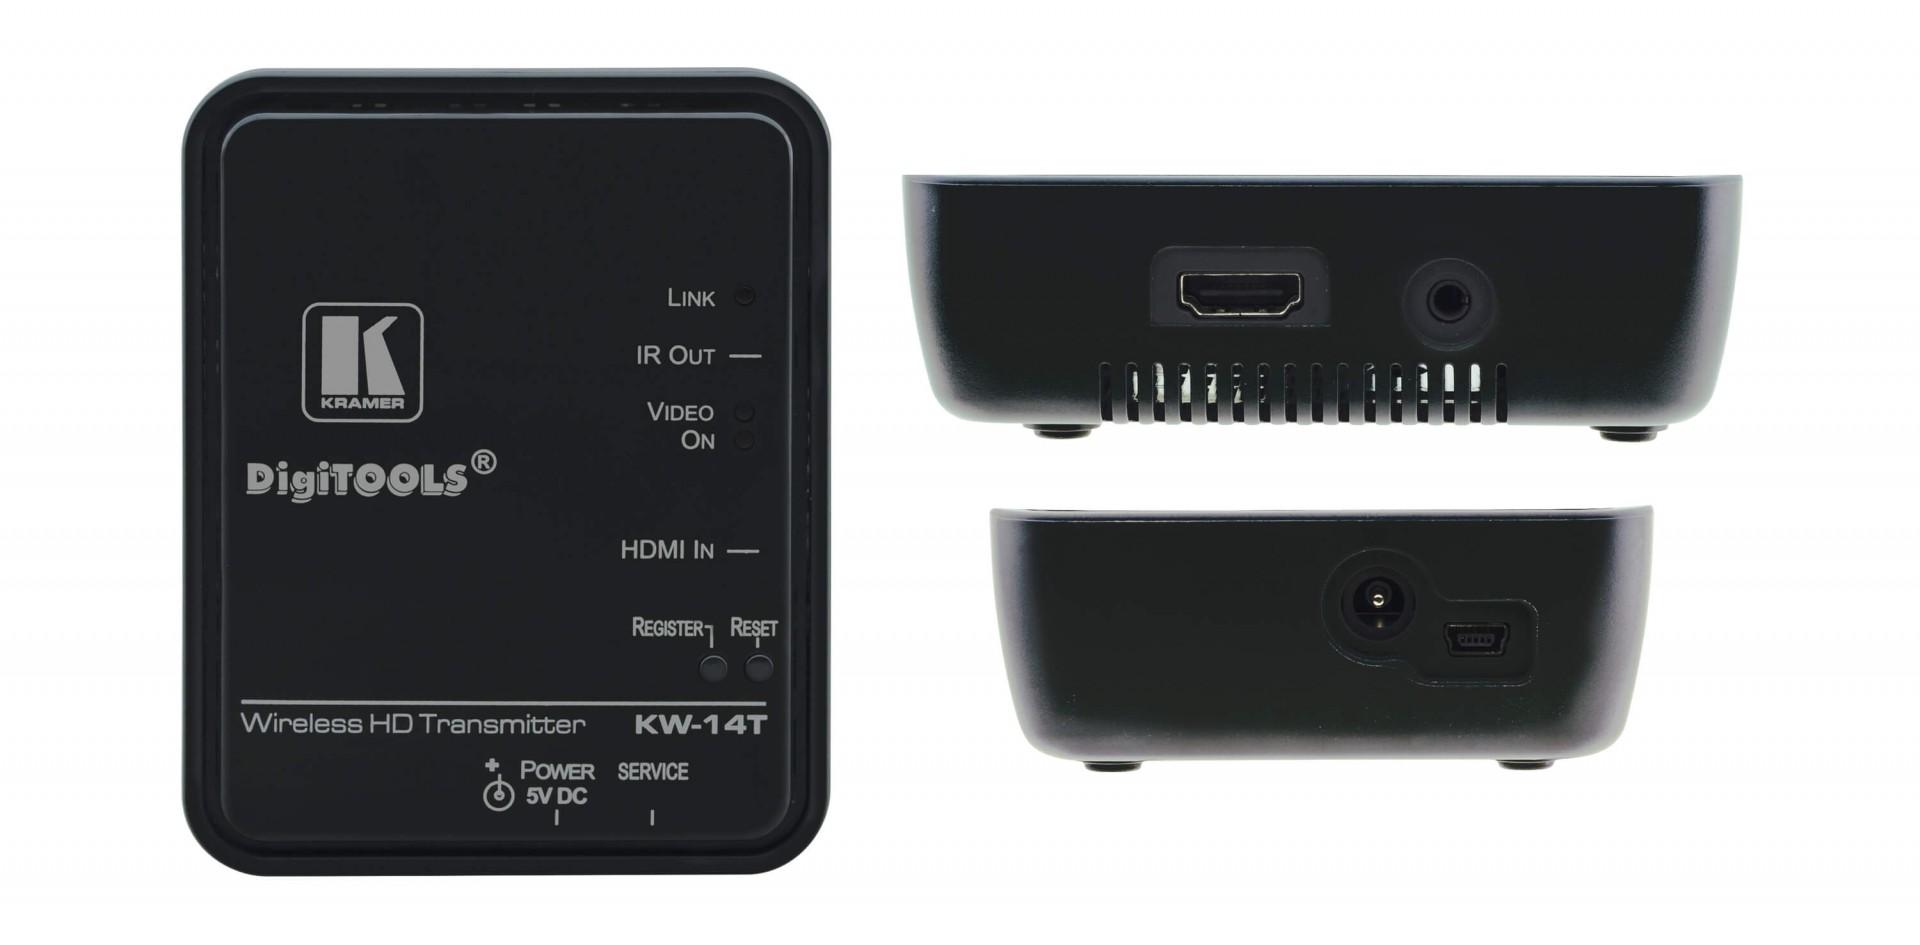 Kramer KW-14 Wireless HD Transmitter & Receiver